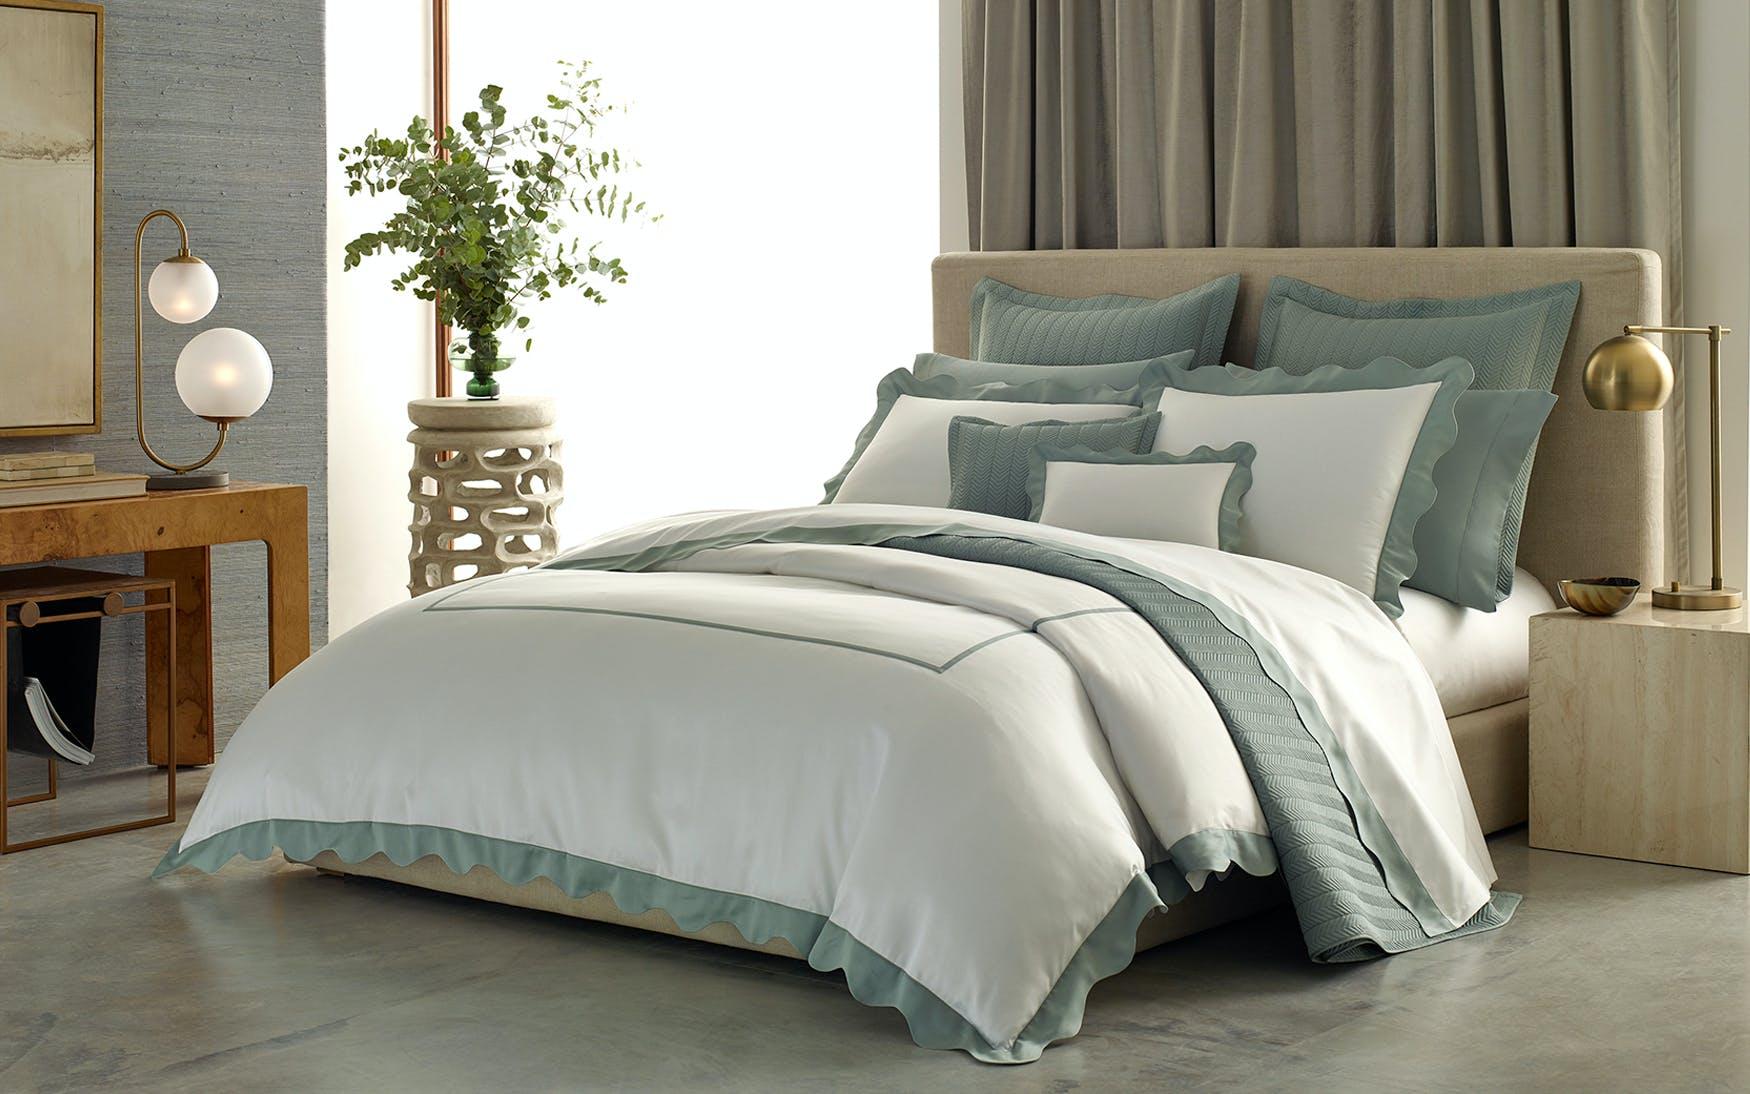 Carolina Sham Matouk Luxury Linens